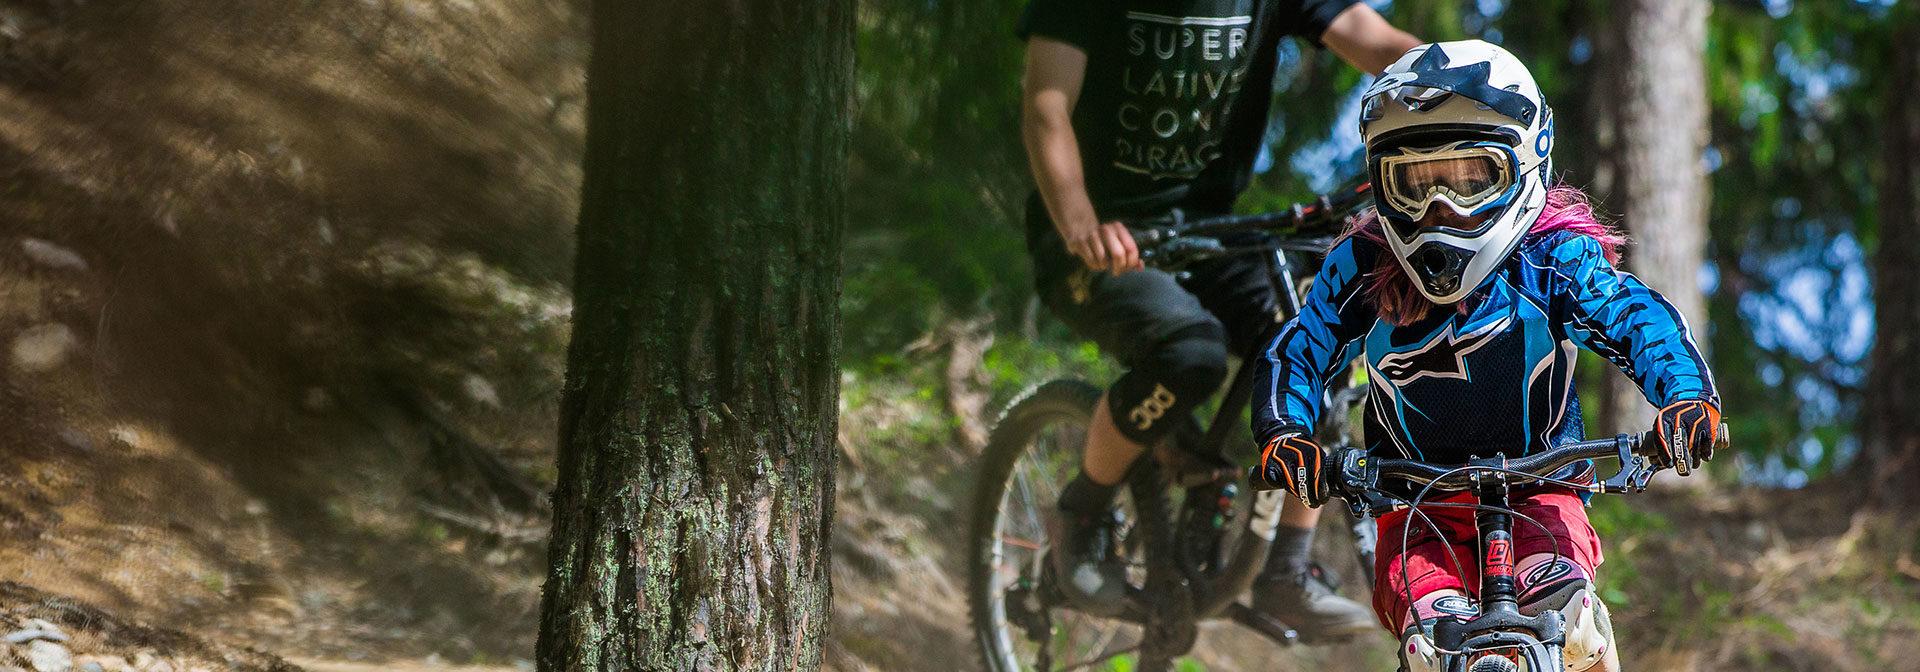 Sweden by Bike - Järvsö MTB